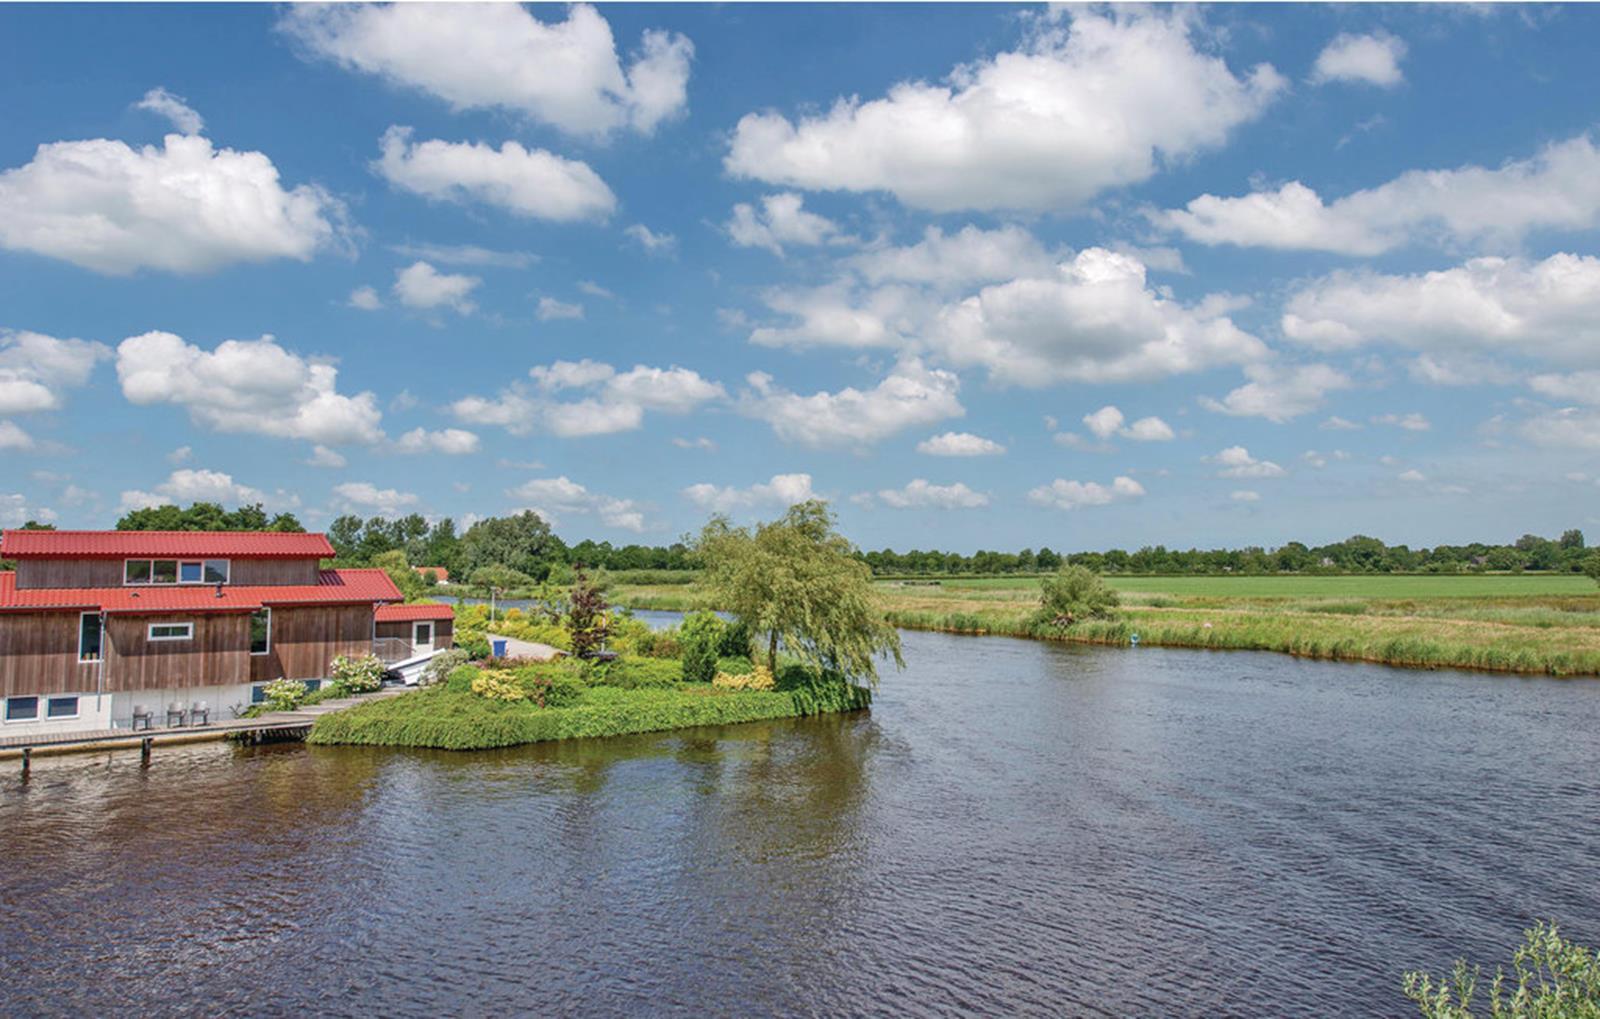 Vakantiehuis te koop Friesland Noardburgum 033.jpg